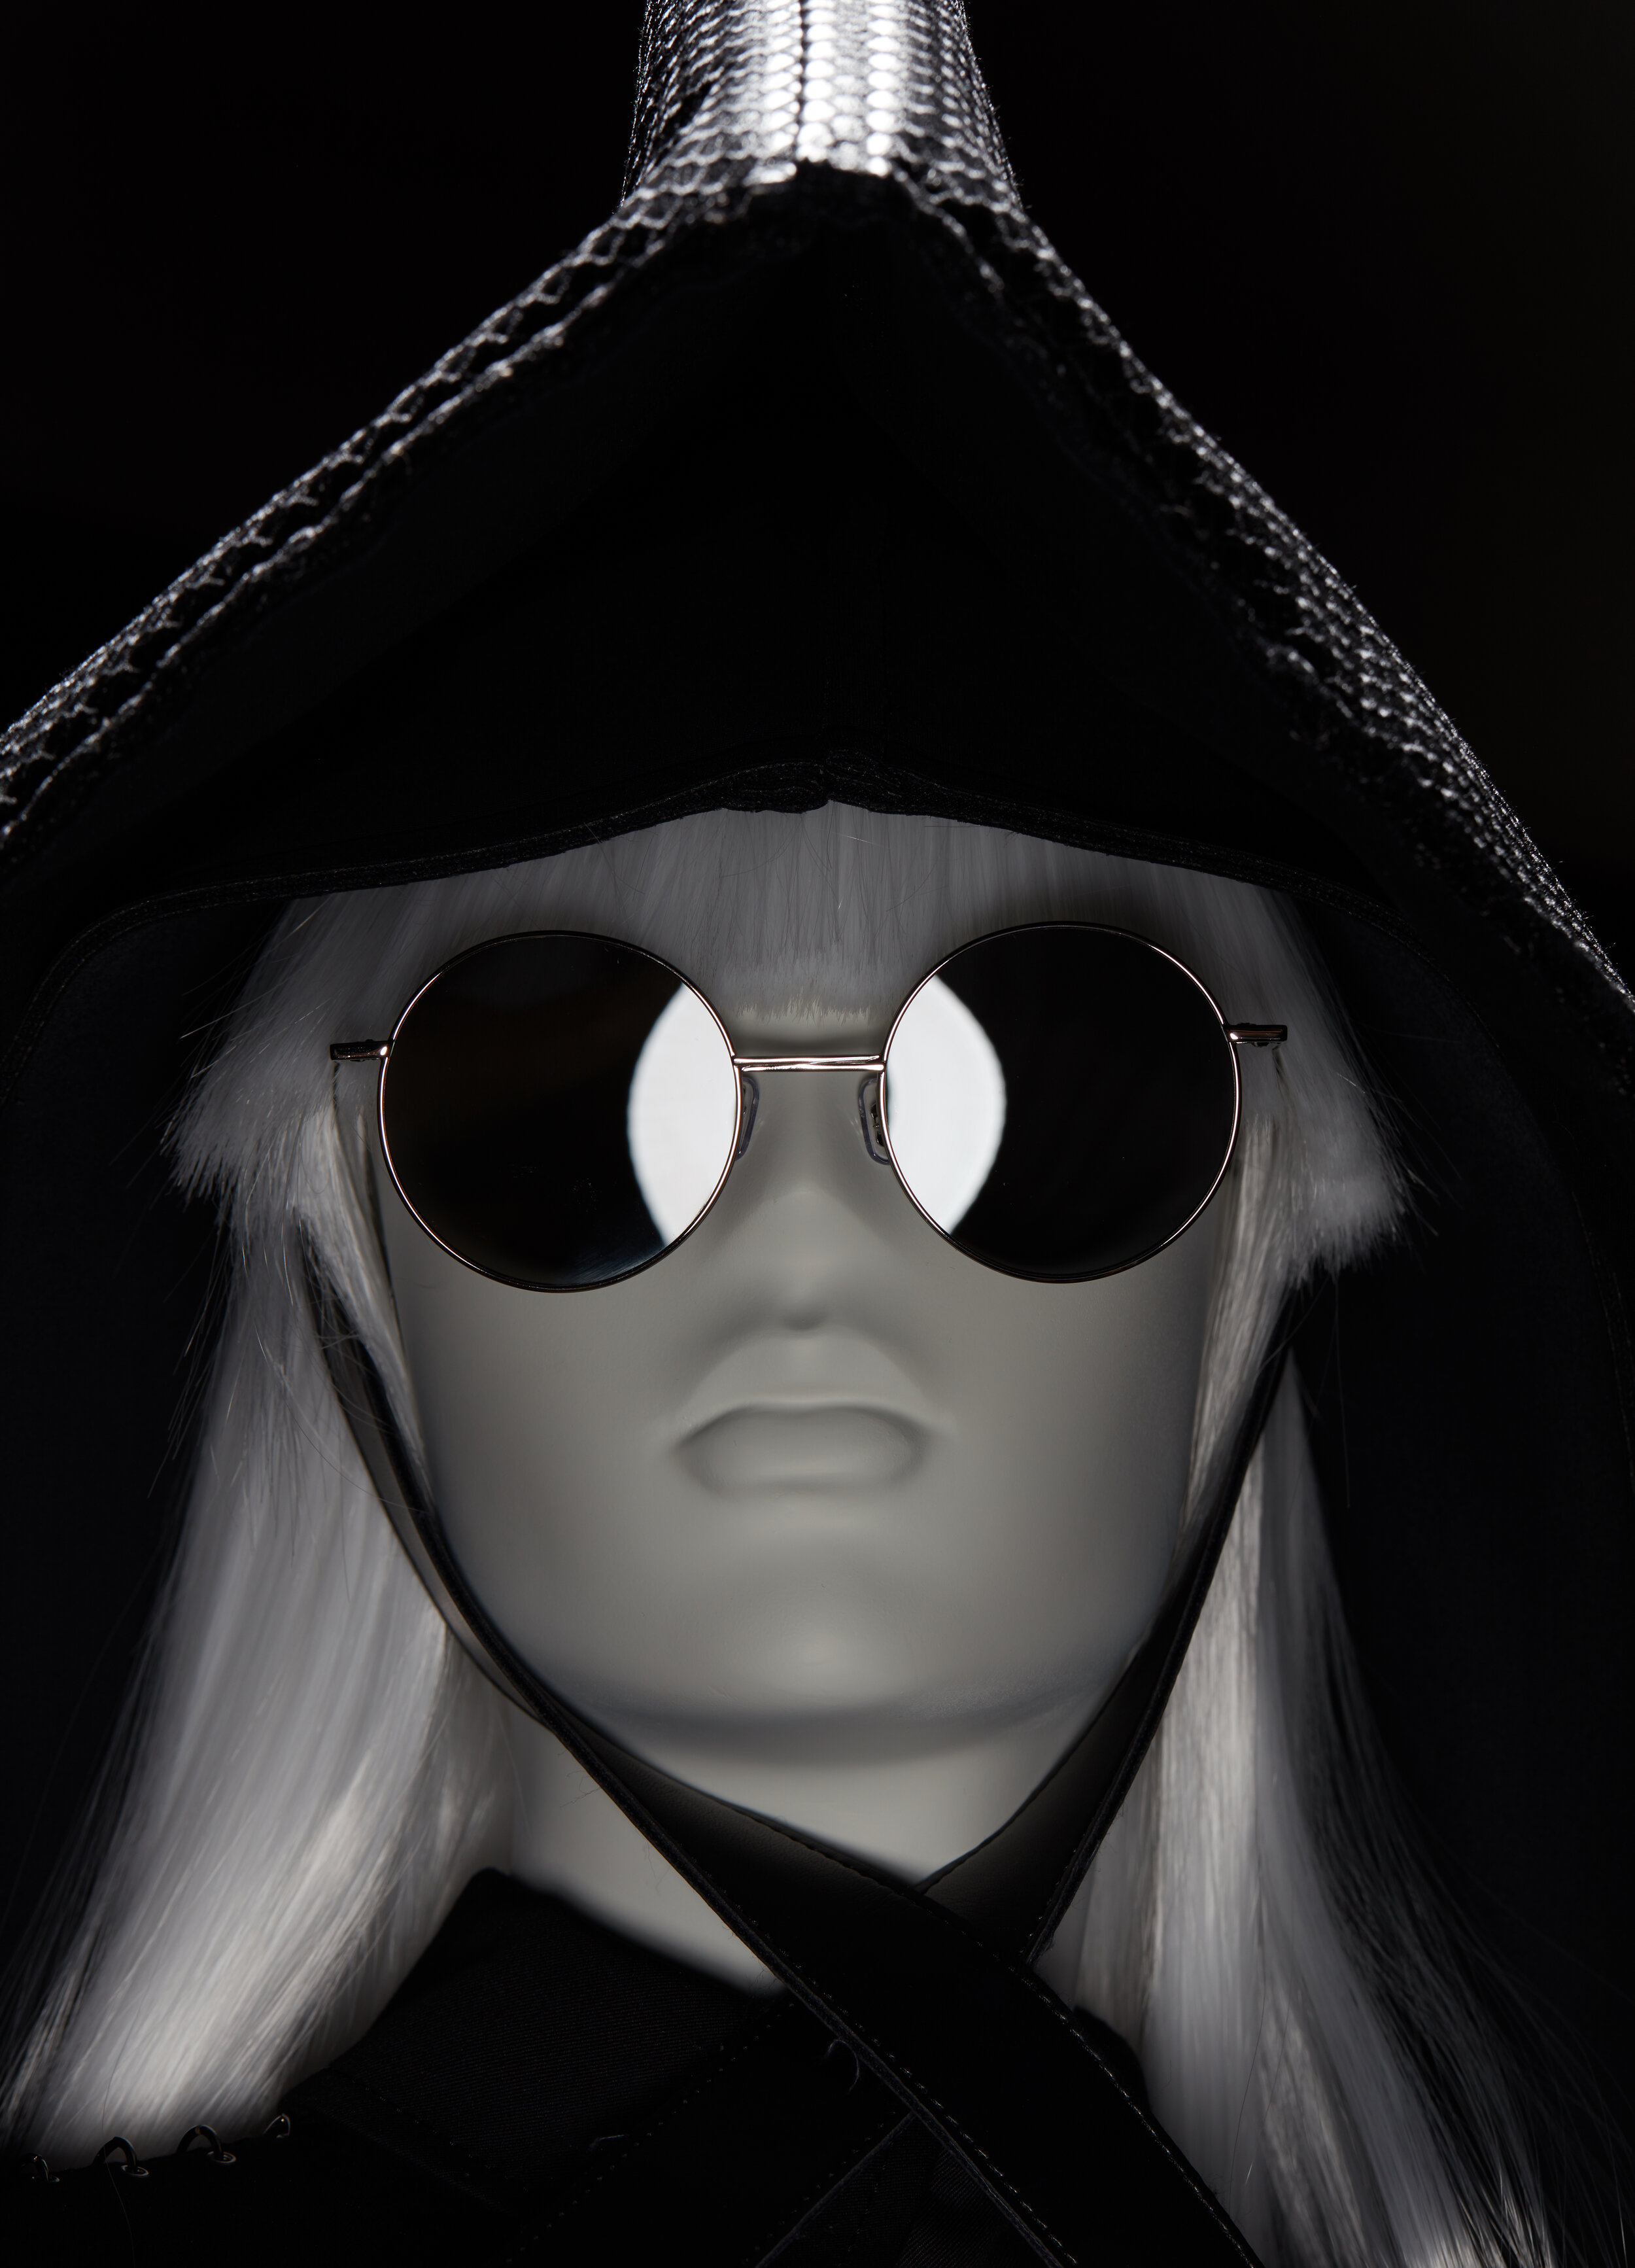 Io wearing Gentle Monster and Comme des Garçons Noir - London, 2019